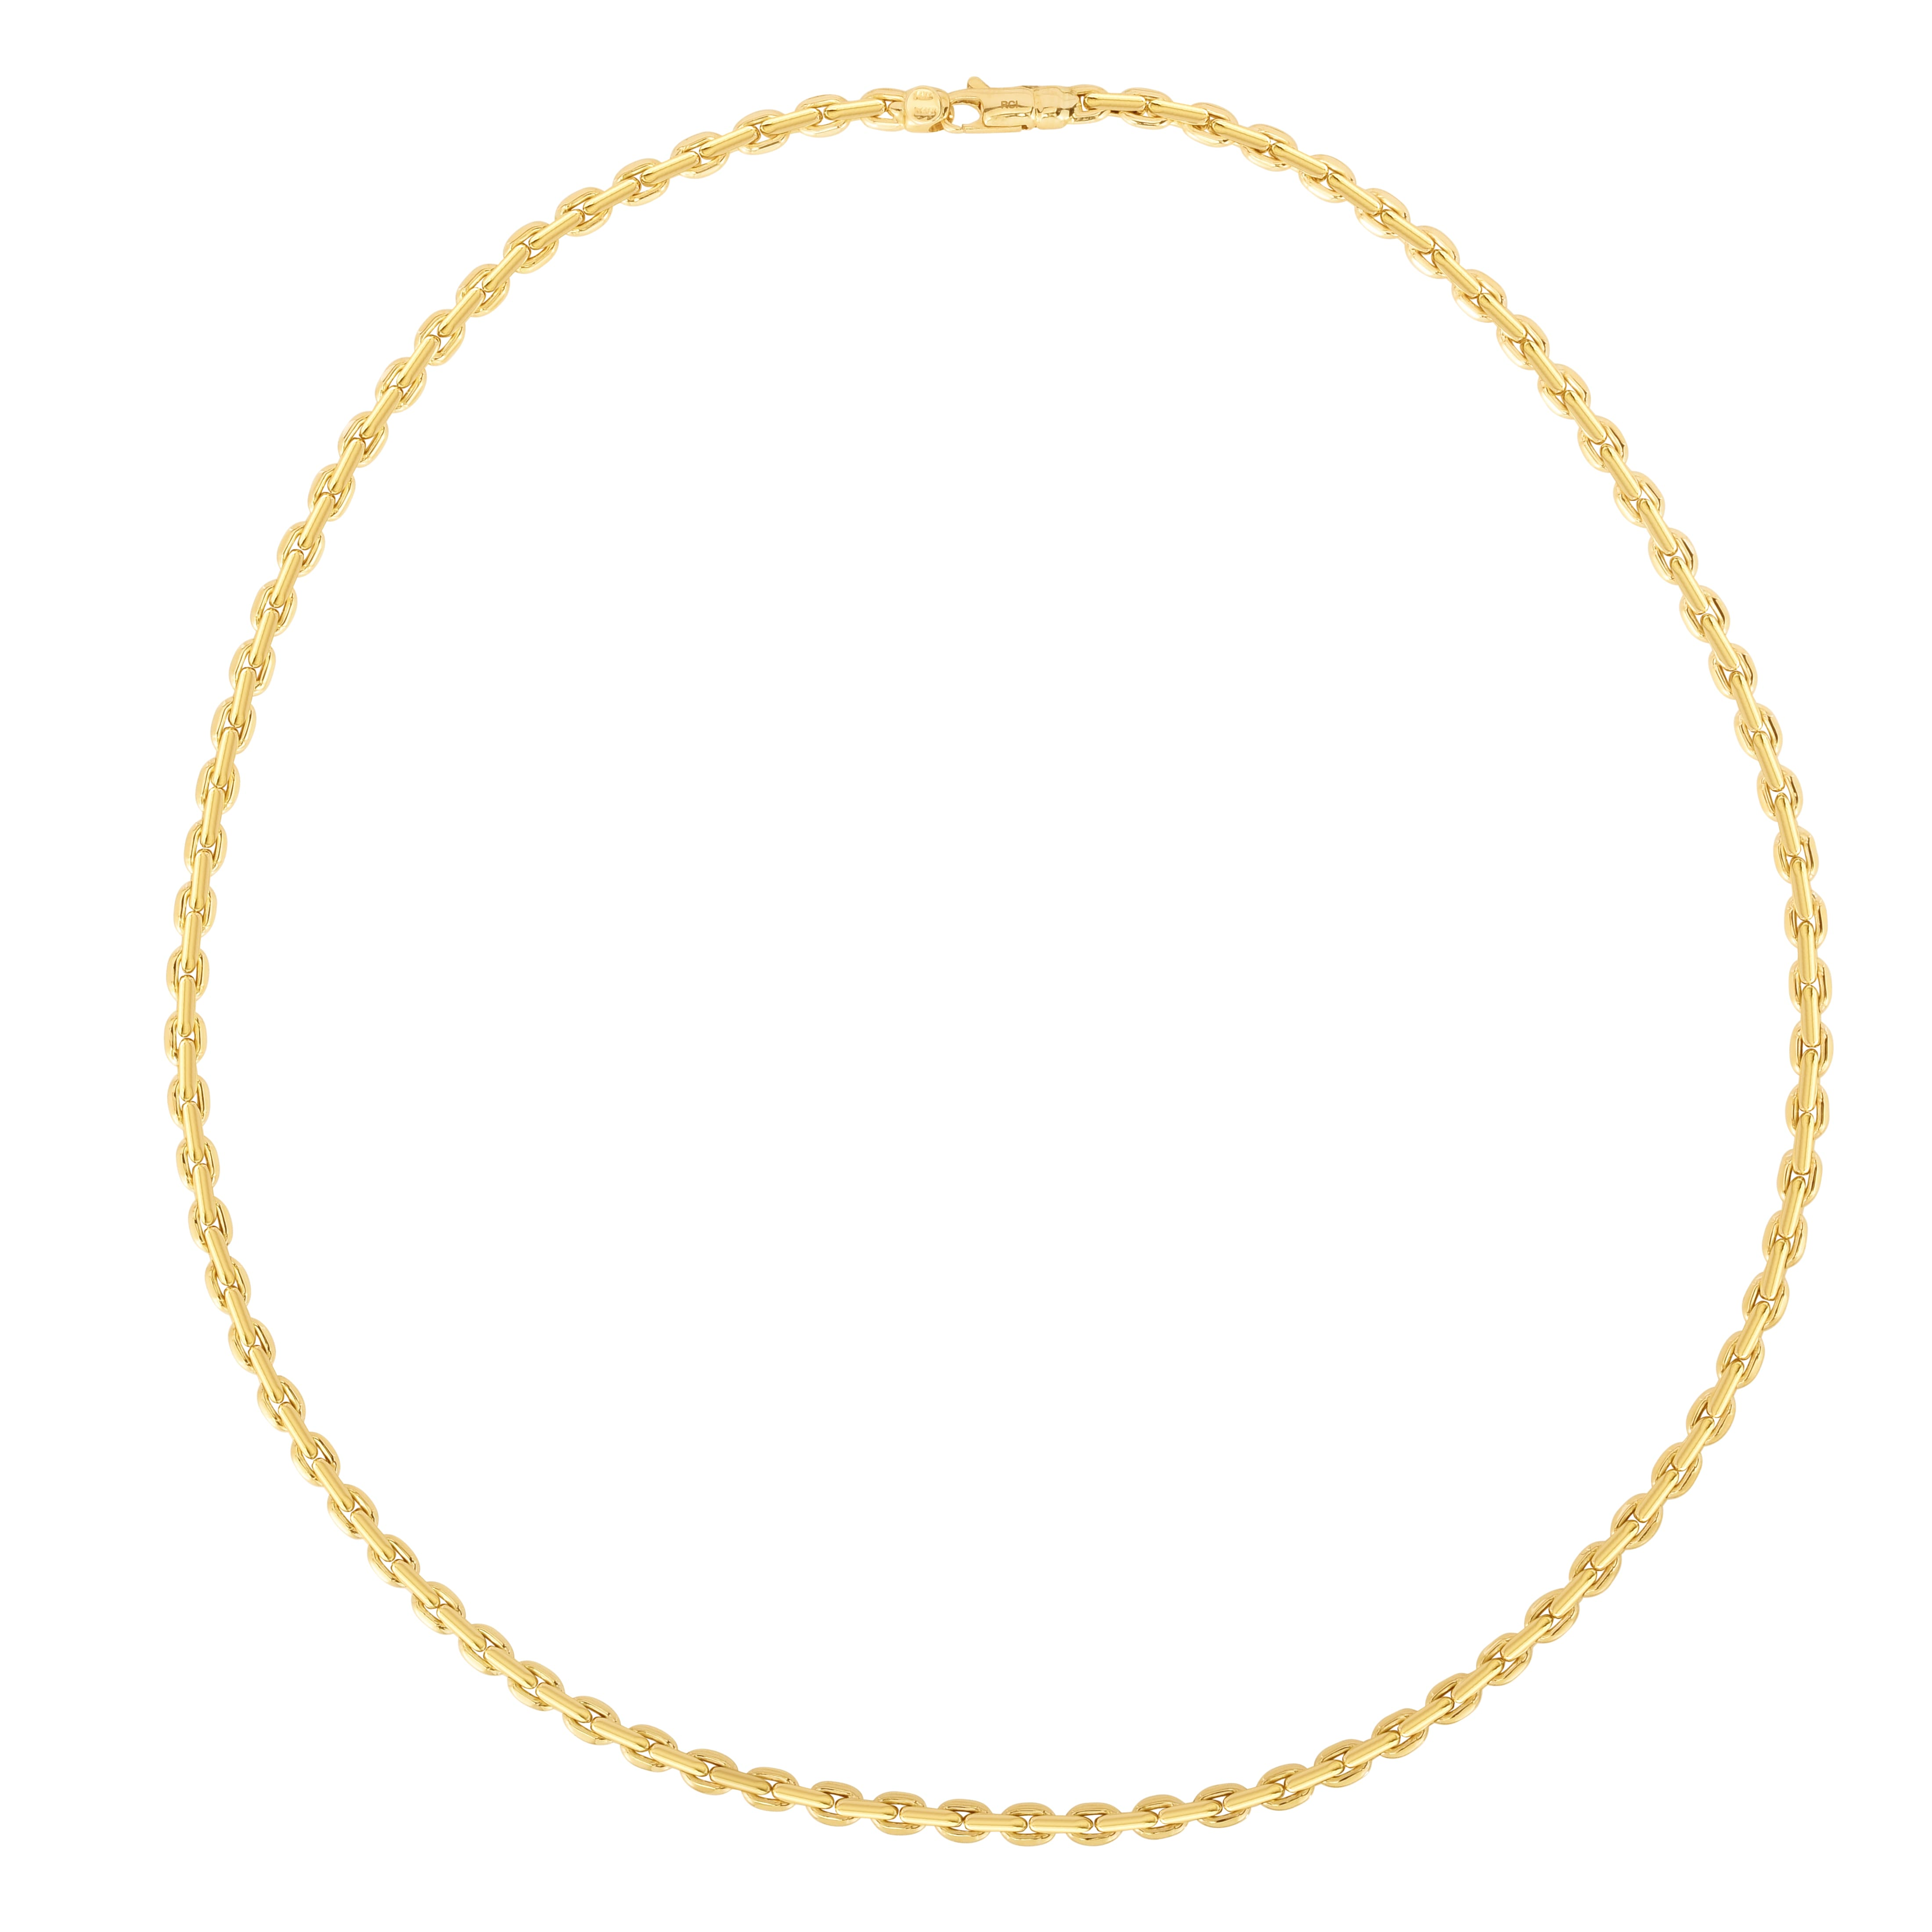 14k-yellow-gold-fancy-interlocking-link-bracelet-rc12760-07_ring